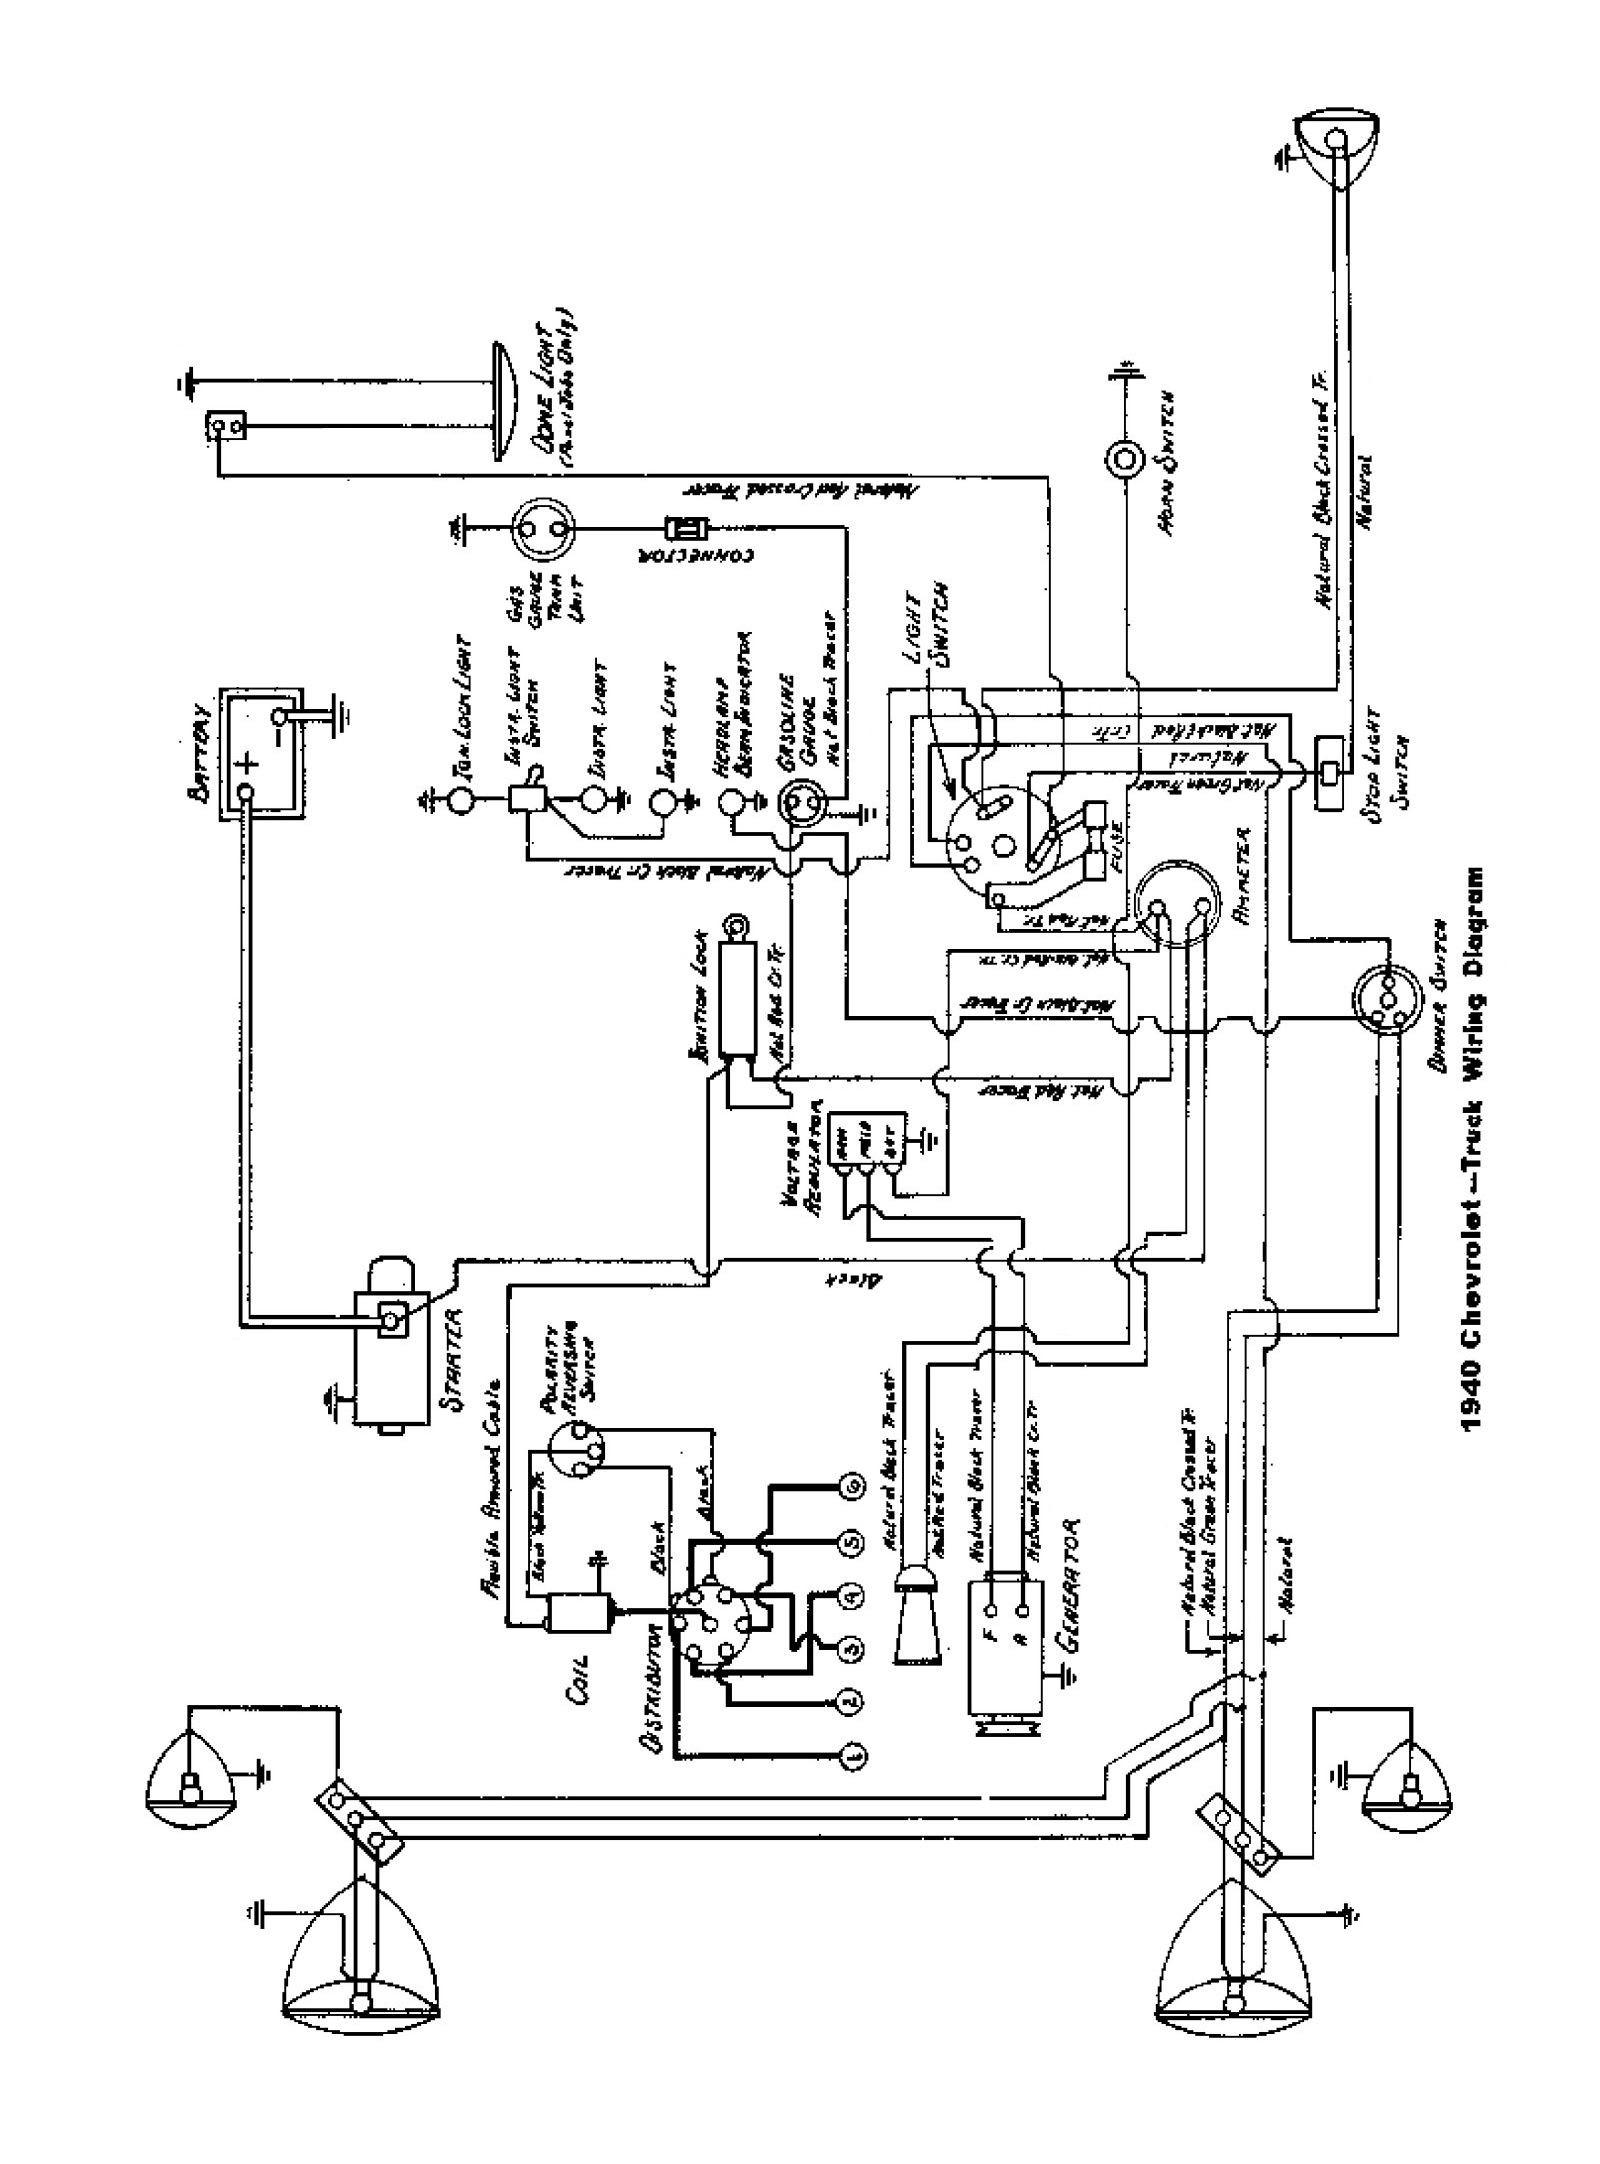 chevy truck wiring diagram 1993 chevy silverado wiring